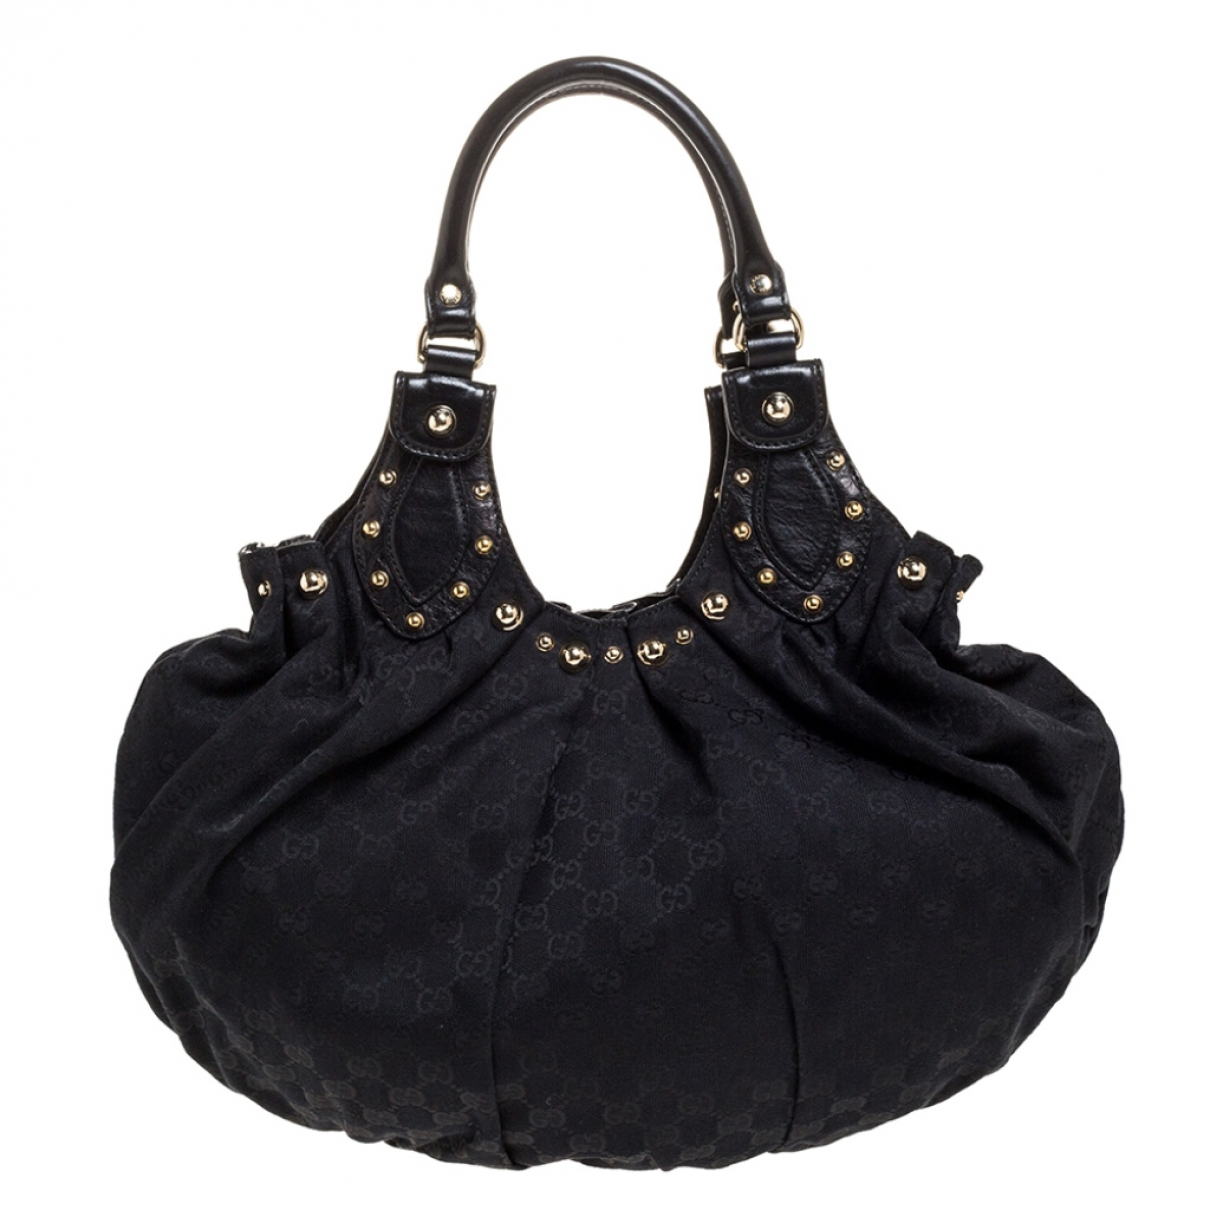 Gucci Pelham Black Leather handbag for Women N